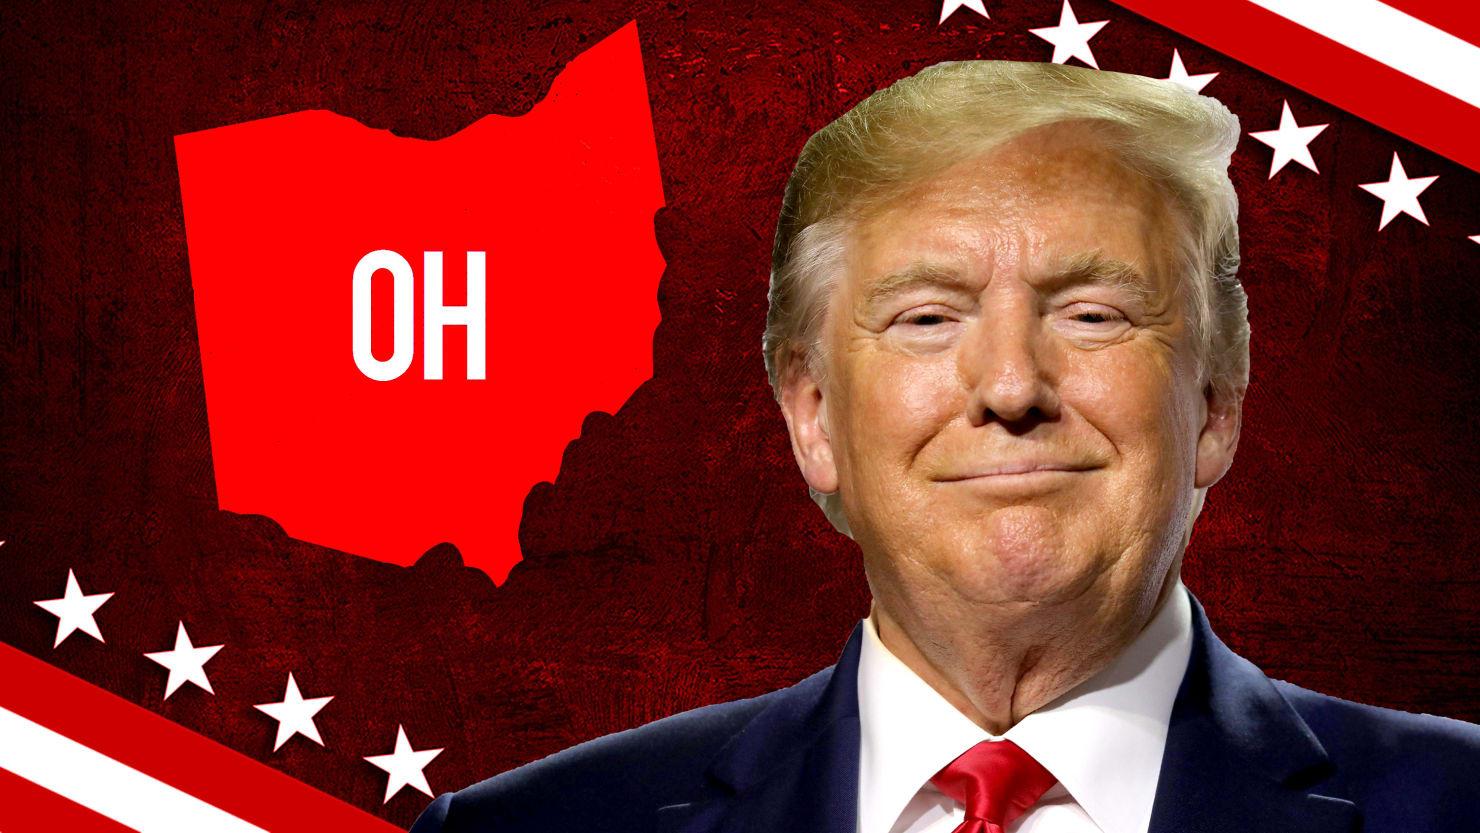 Donald Trump Sweeps Ohio Again